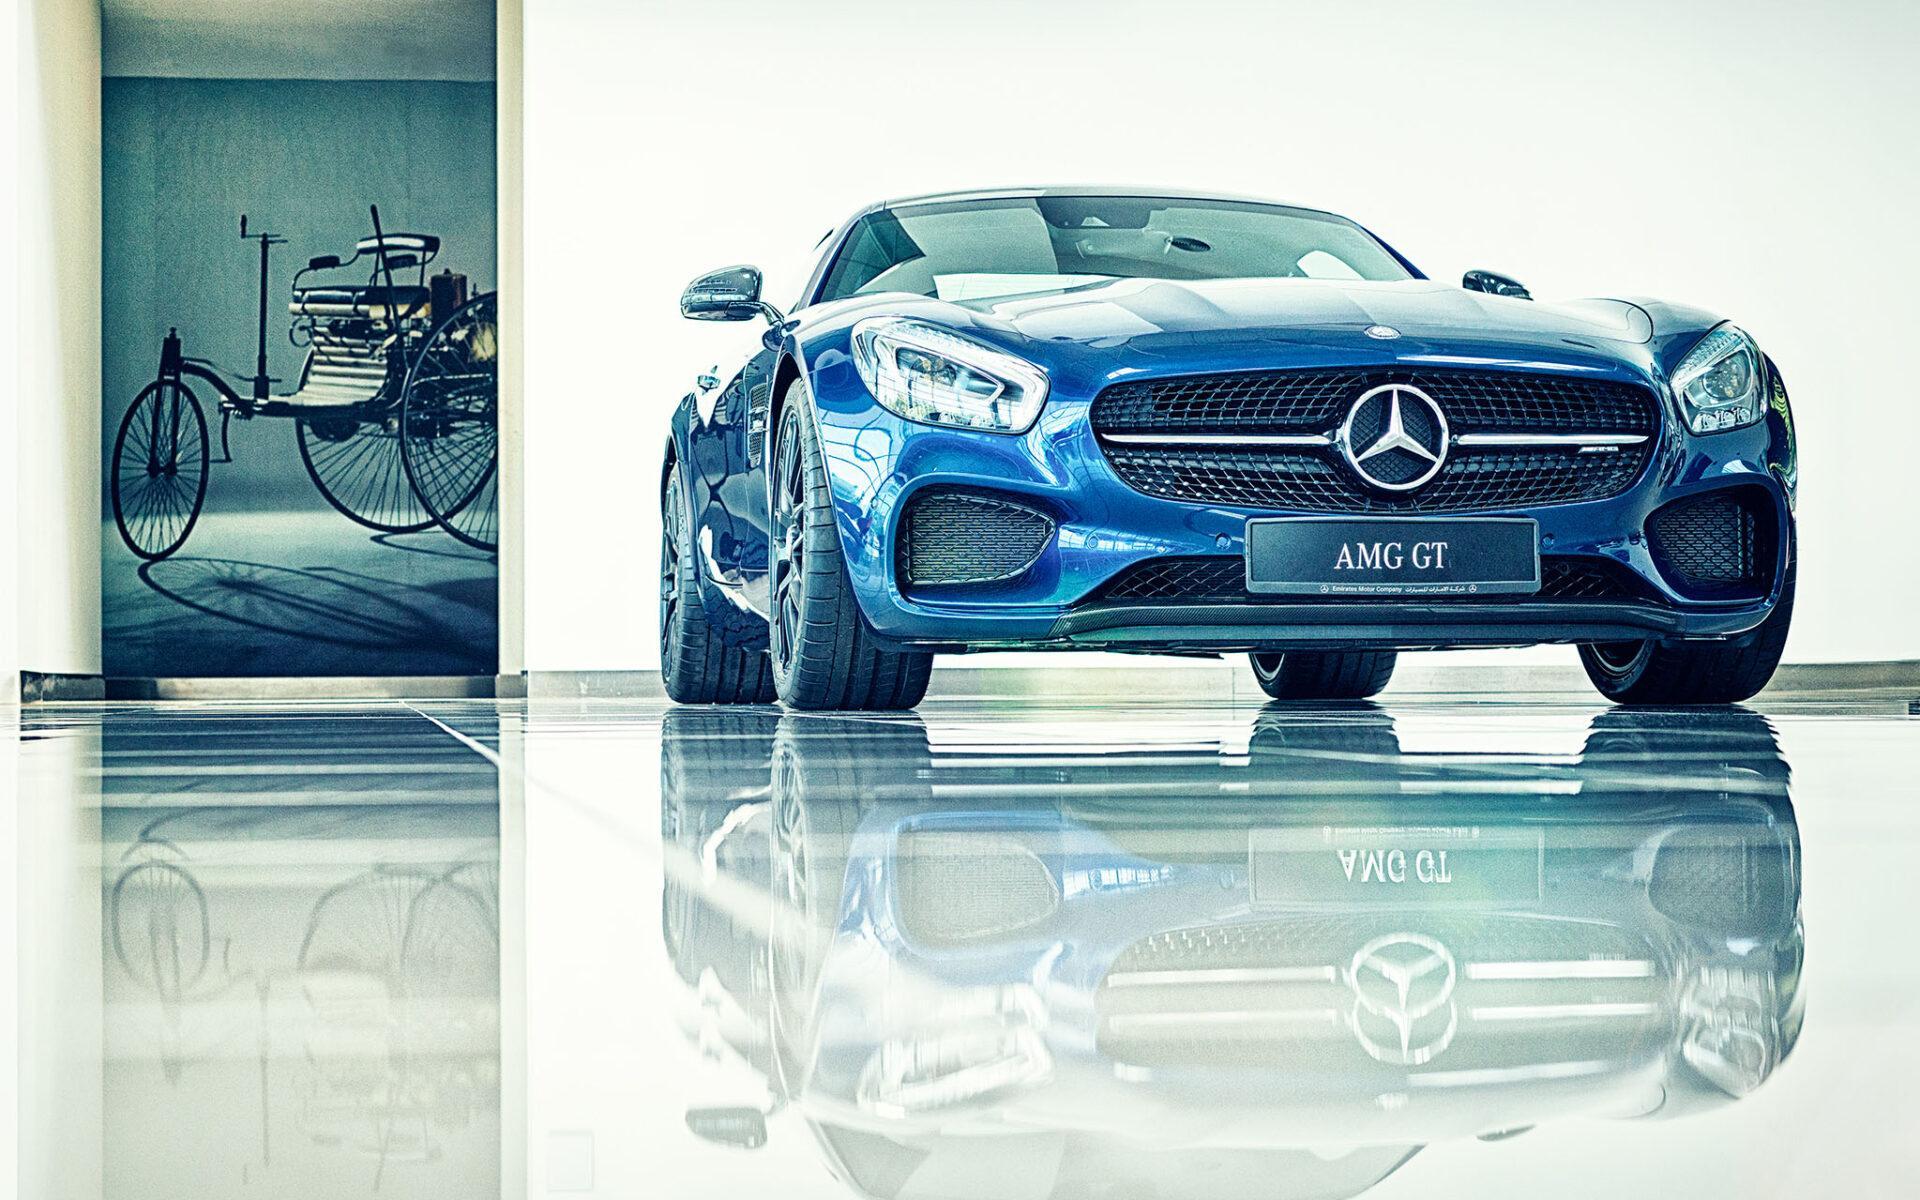 Video & Film Production Dubai - UAE - image hg_Harniman_Mercedes-GT-1920x1200 on https://www.kalideme.com